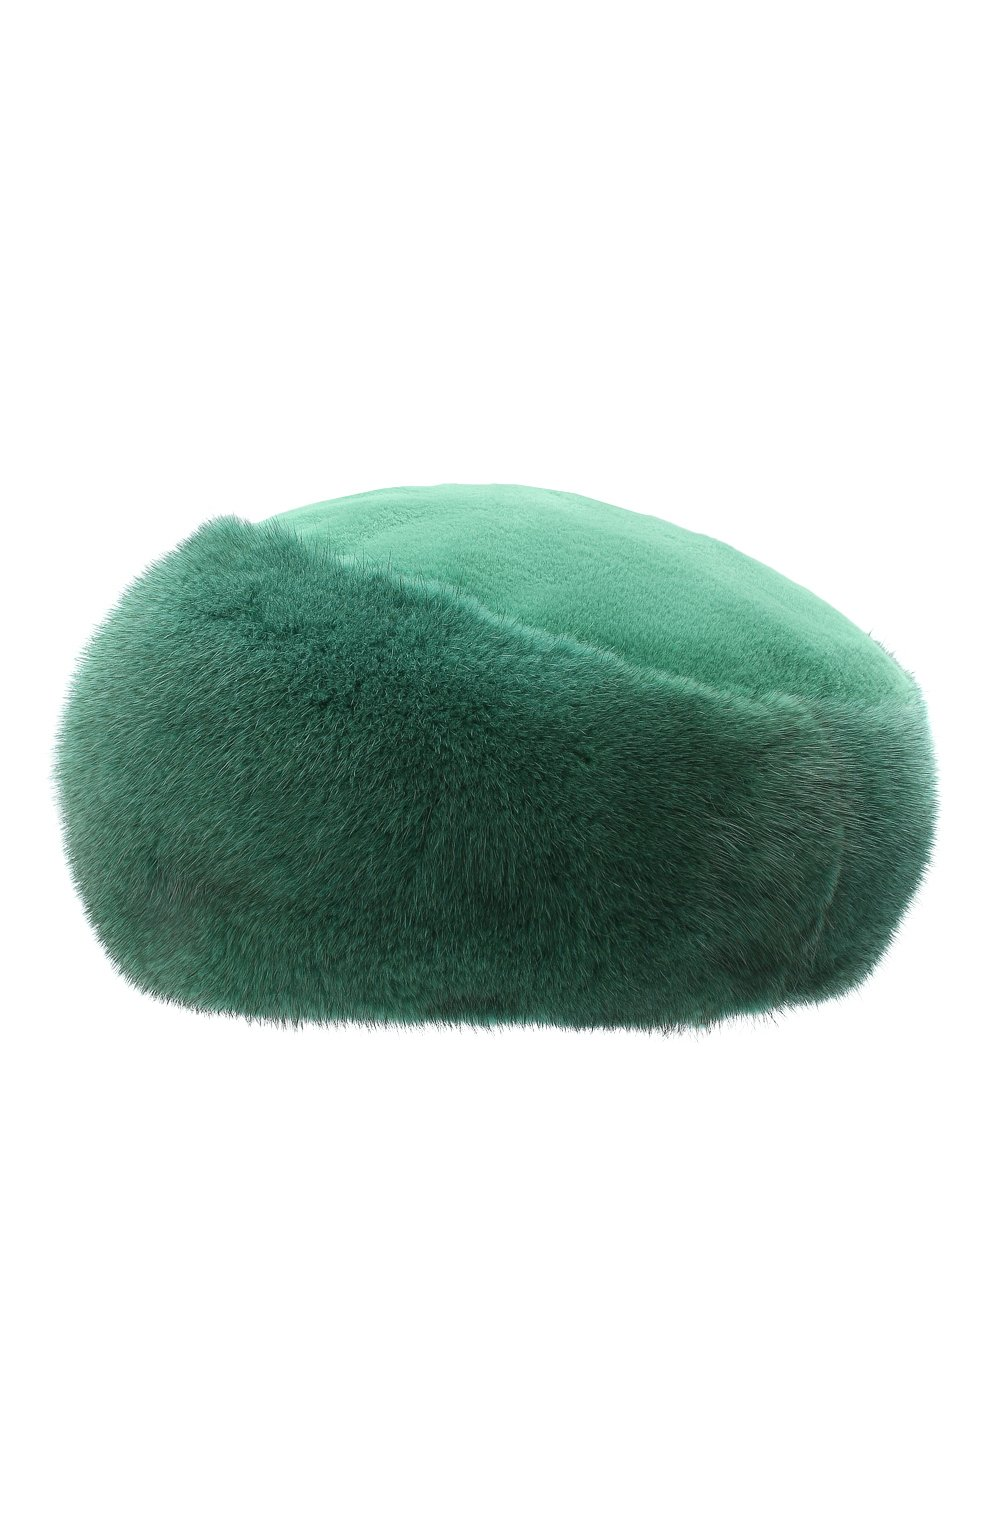 Женский берет из меха норки милари FURLAND зеленого цвета, арт. 0123200140198600136 | Фото 2